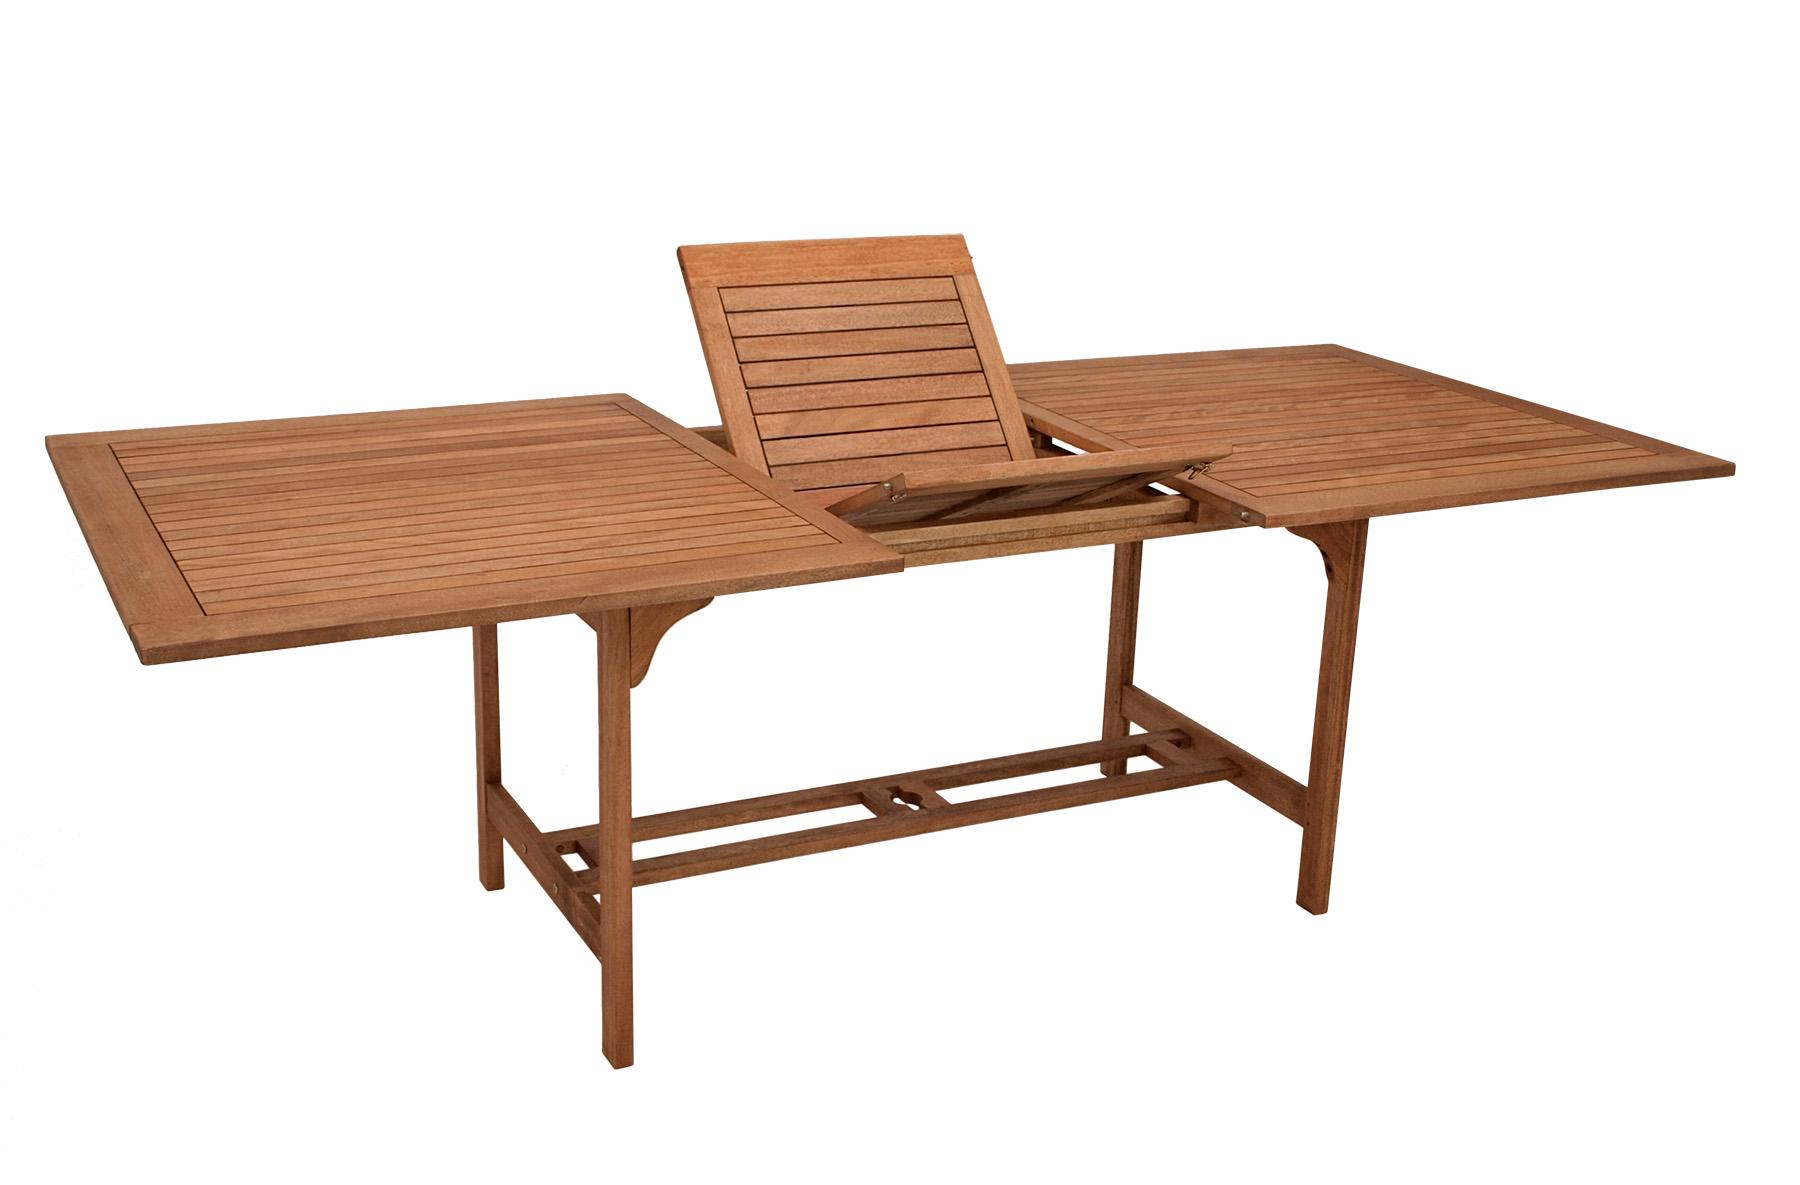 xxl ausziehtisch cordoba eukalyptus 180 230x100cm fsc zertifiziert 2 wahl ebay. Black Bedroom Furniture Sets. Home Design Ideas